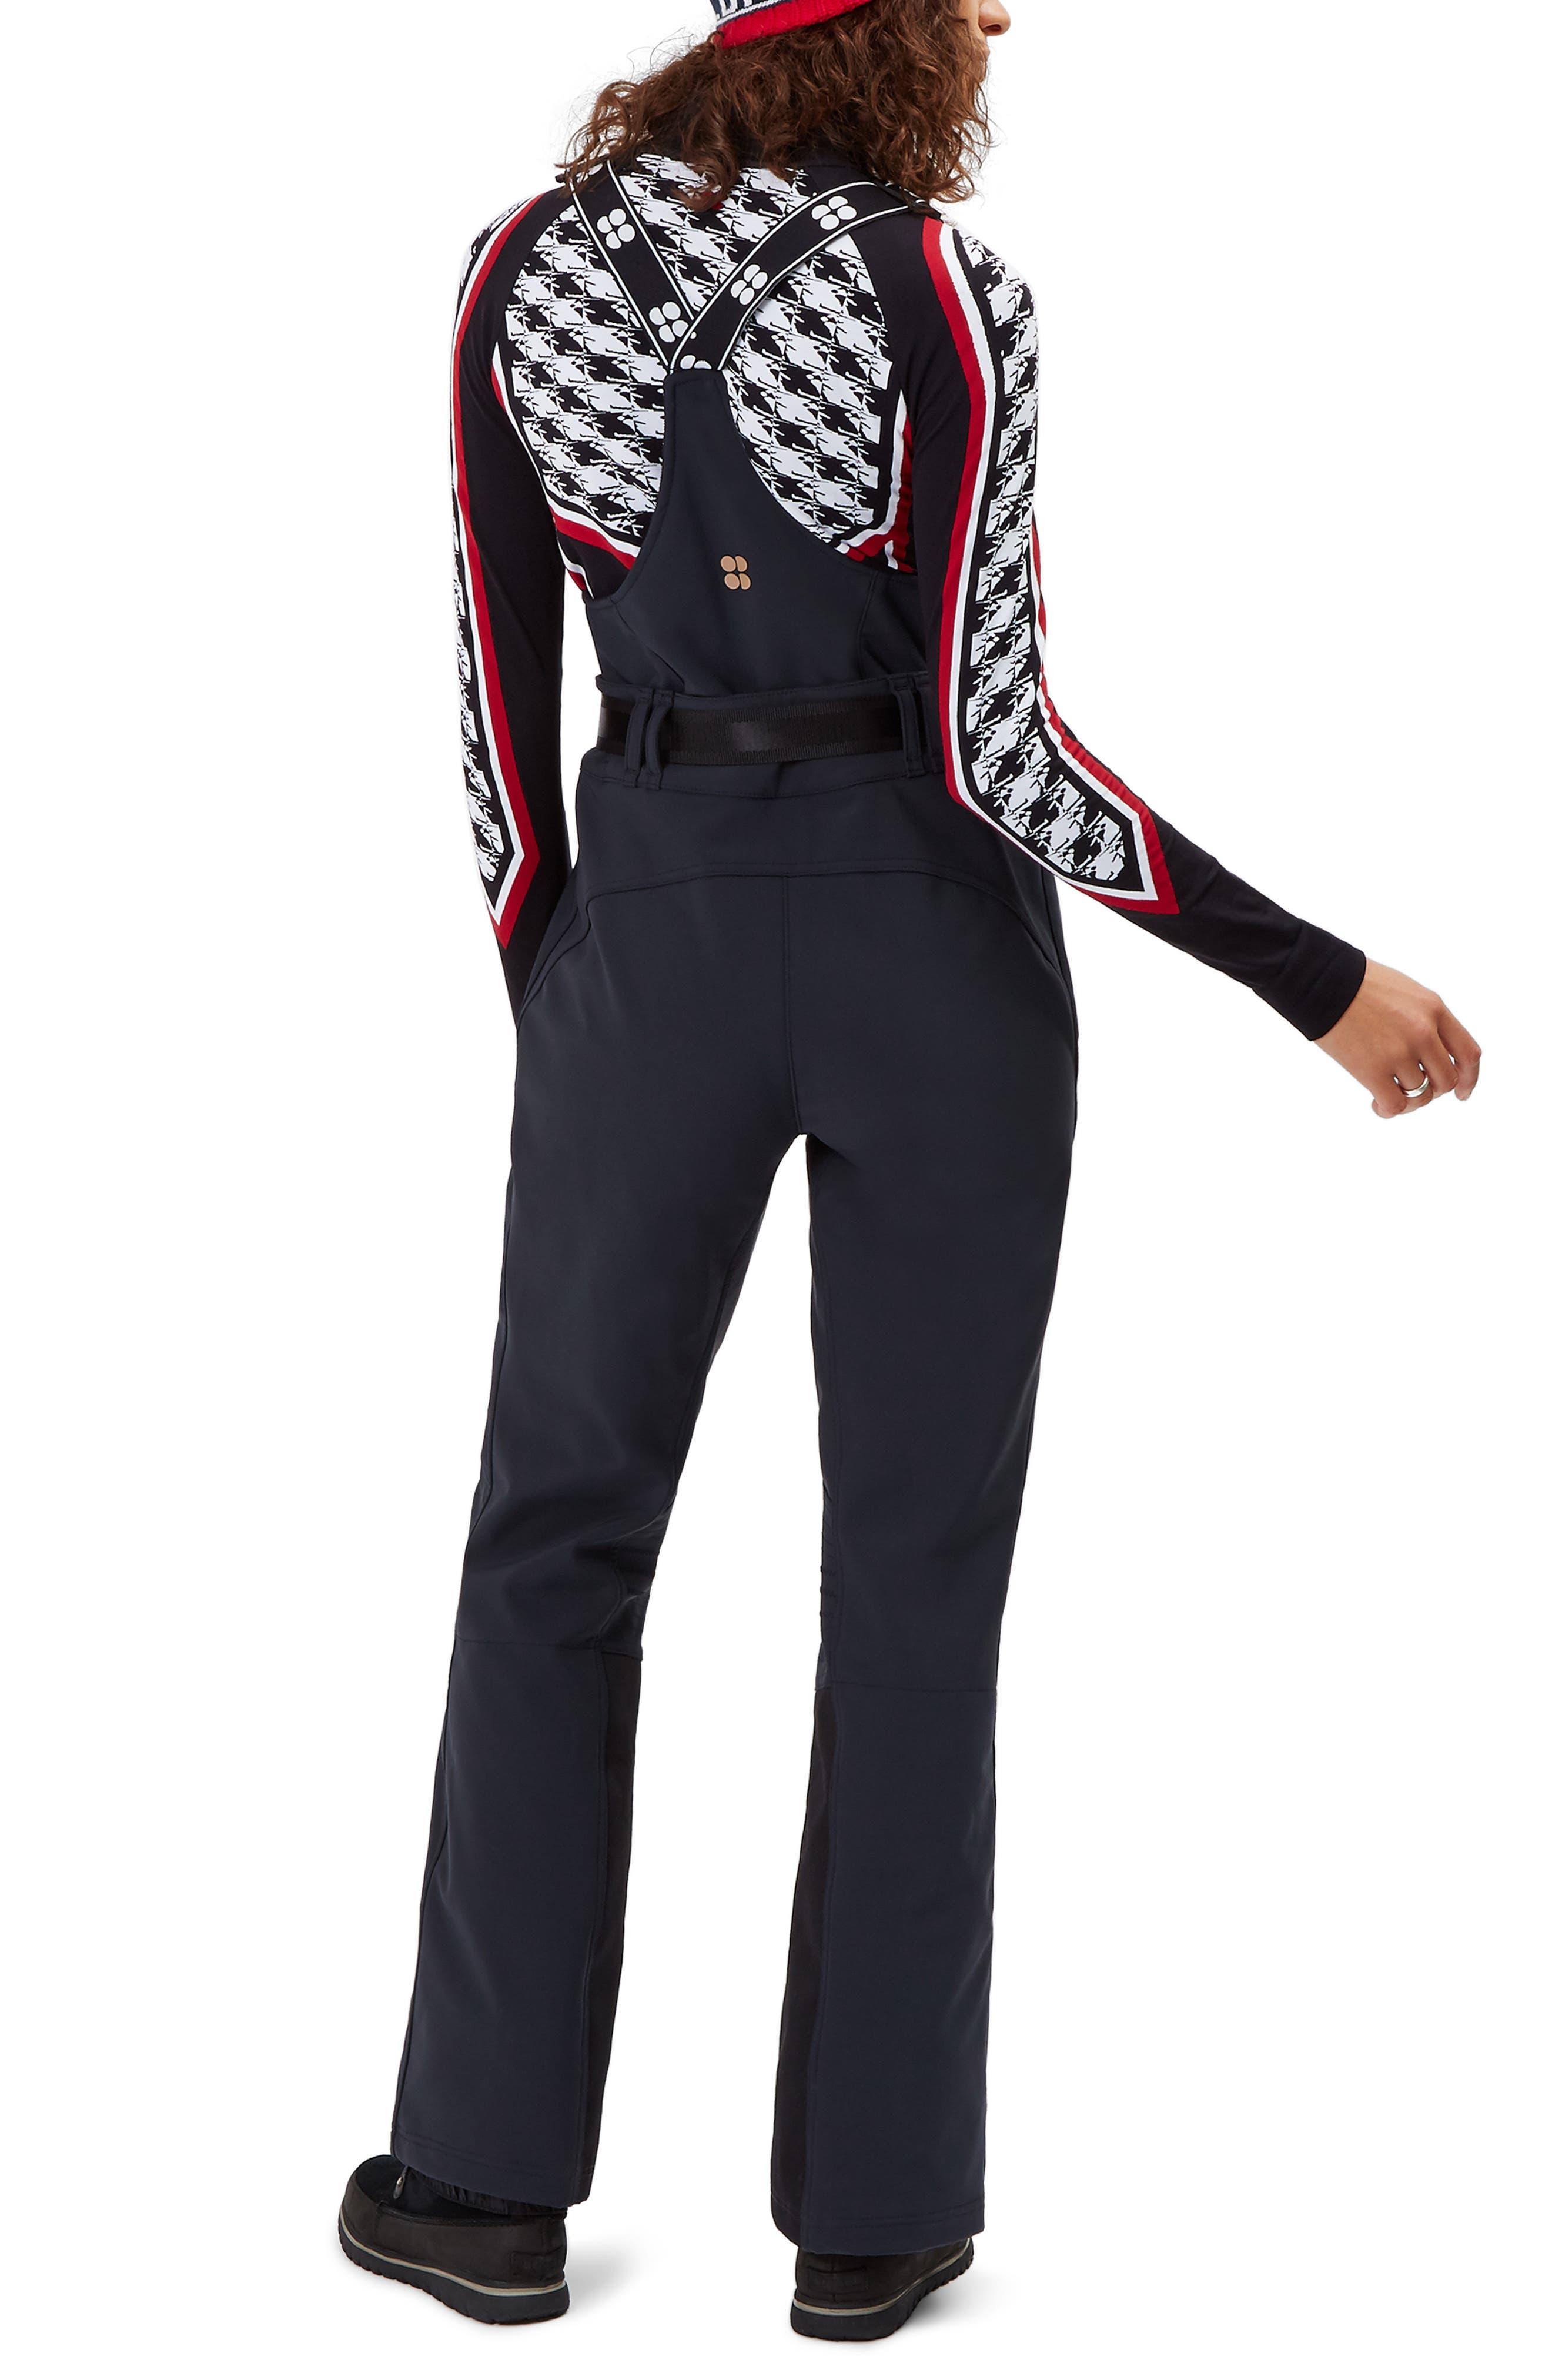 Astro Waterproof Soft Shell Ski Pants,                             Alternate thumbnail 2, color,                             BLACK